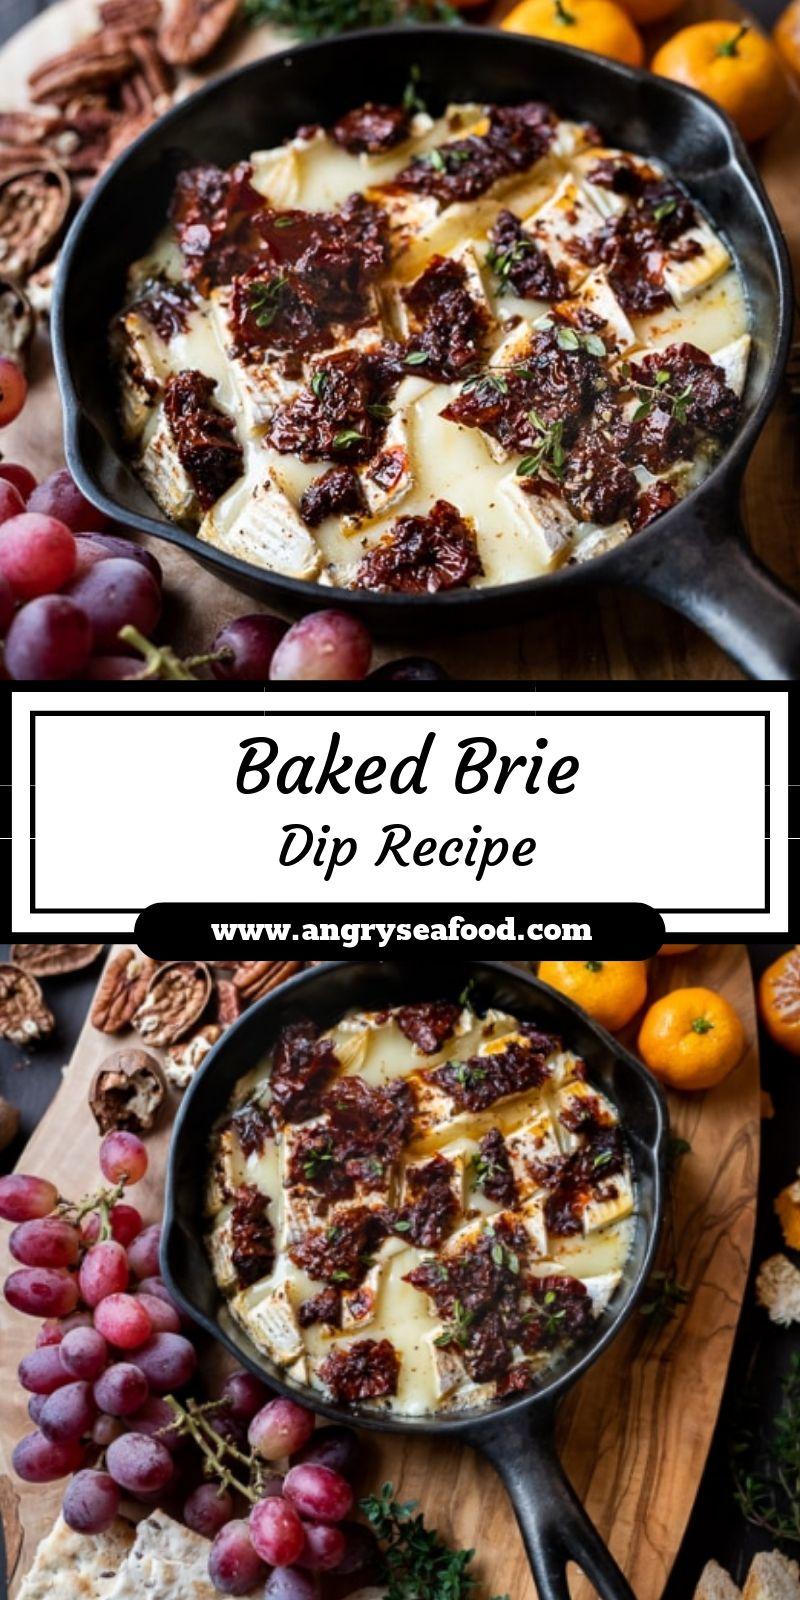 Baked Brie Dip Recipe